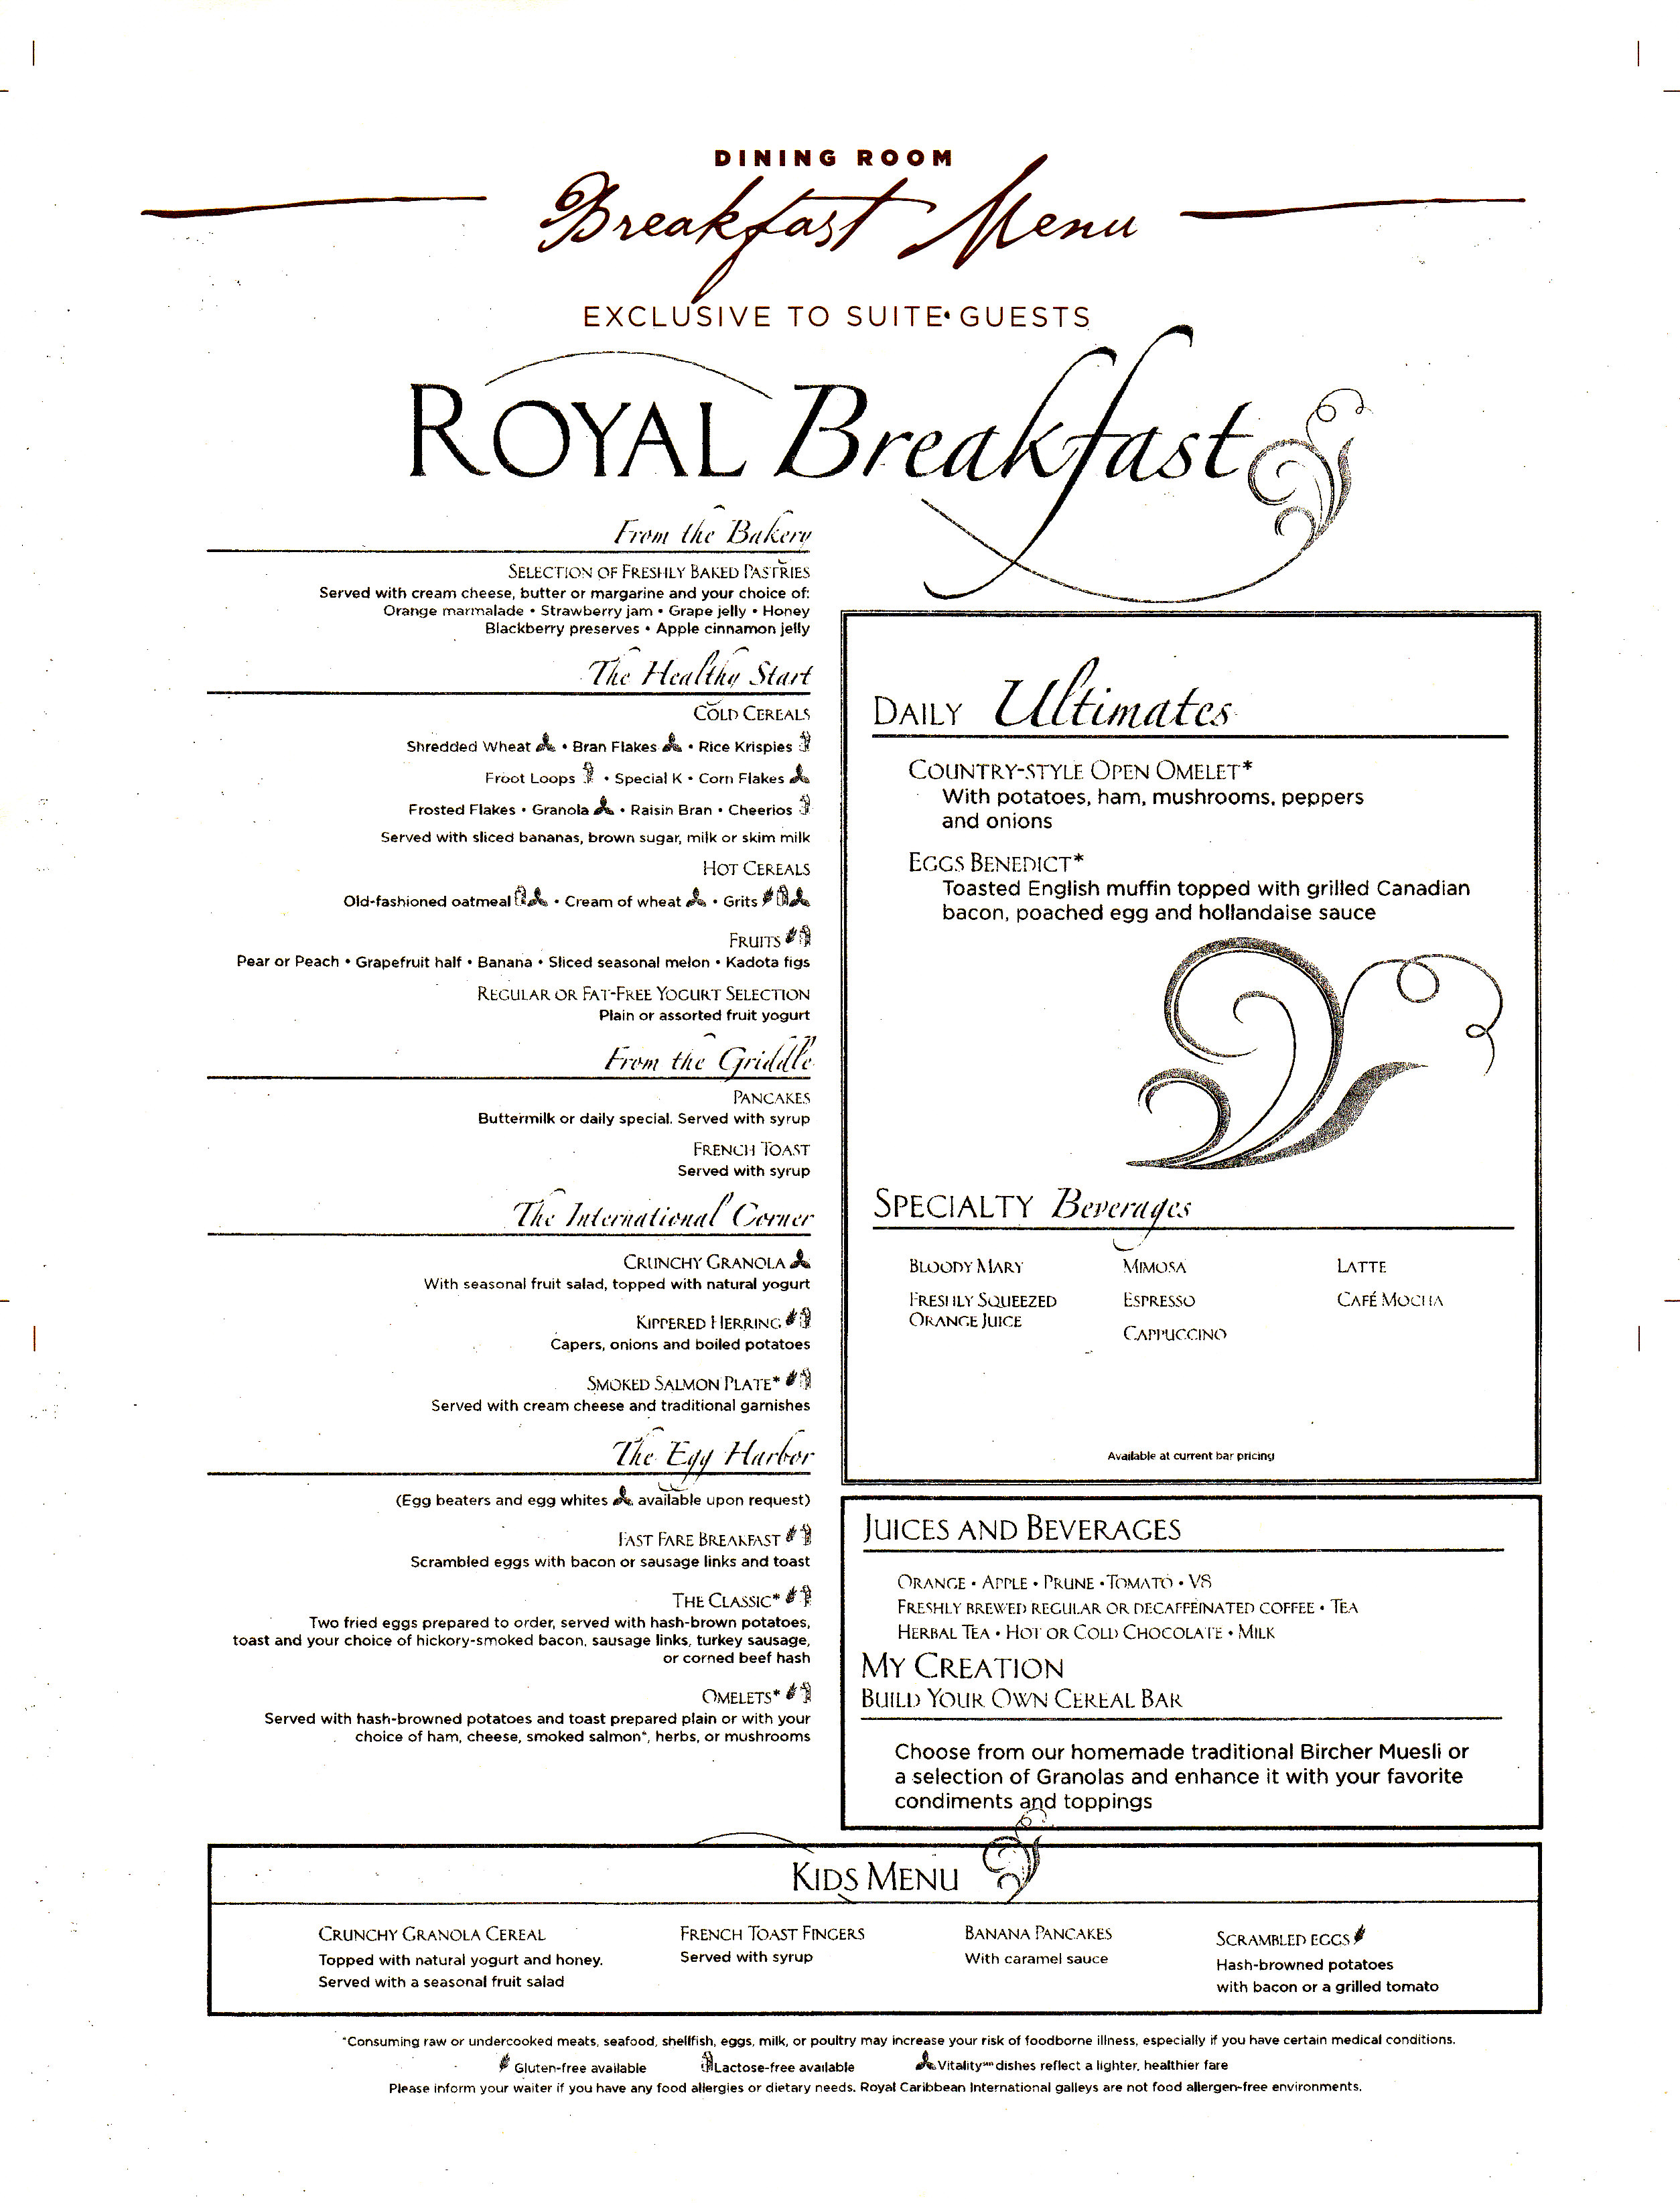 Royal Caribbean Main Dining Room Menu